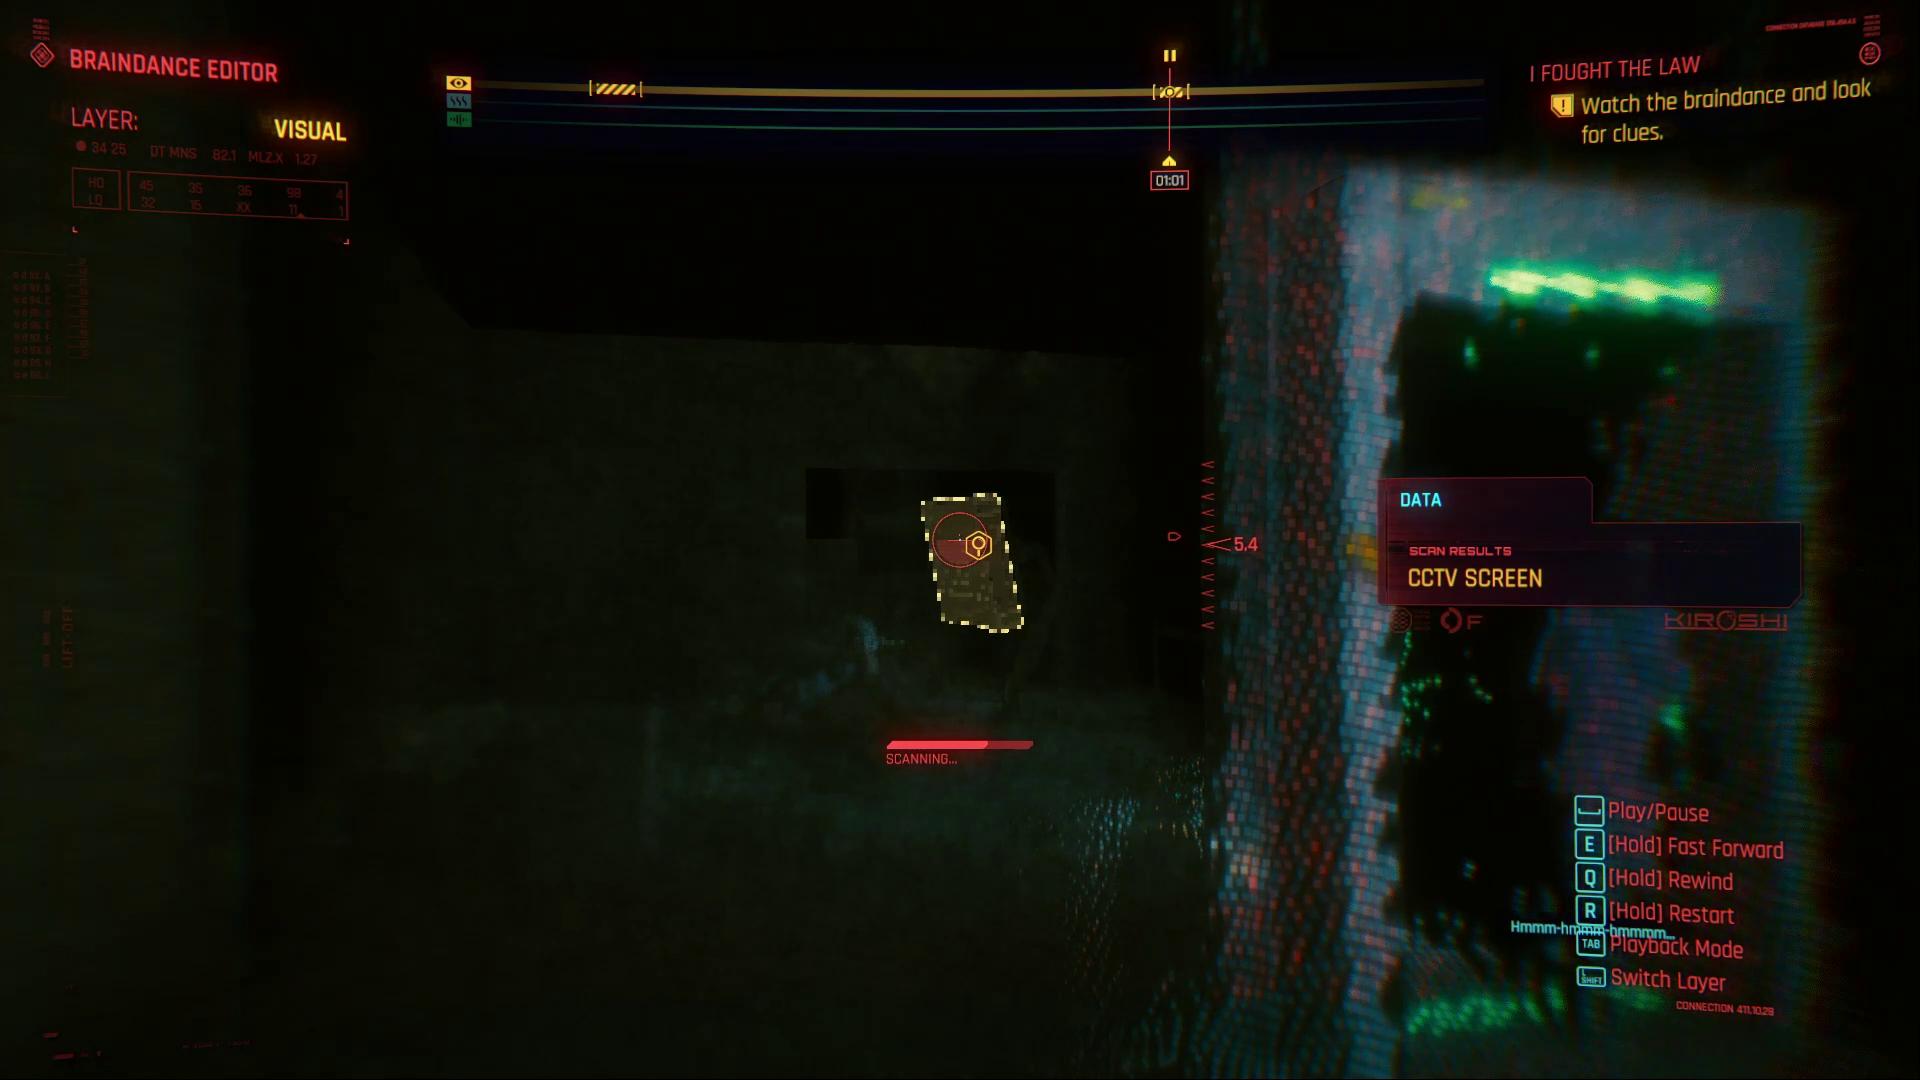 Cyberpunk 2077 CCTV Braindance